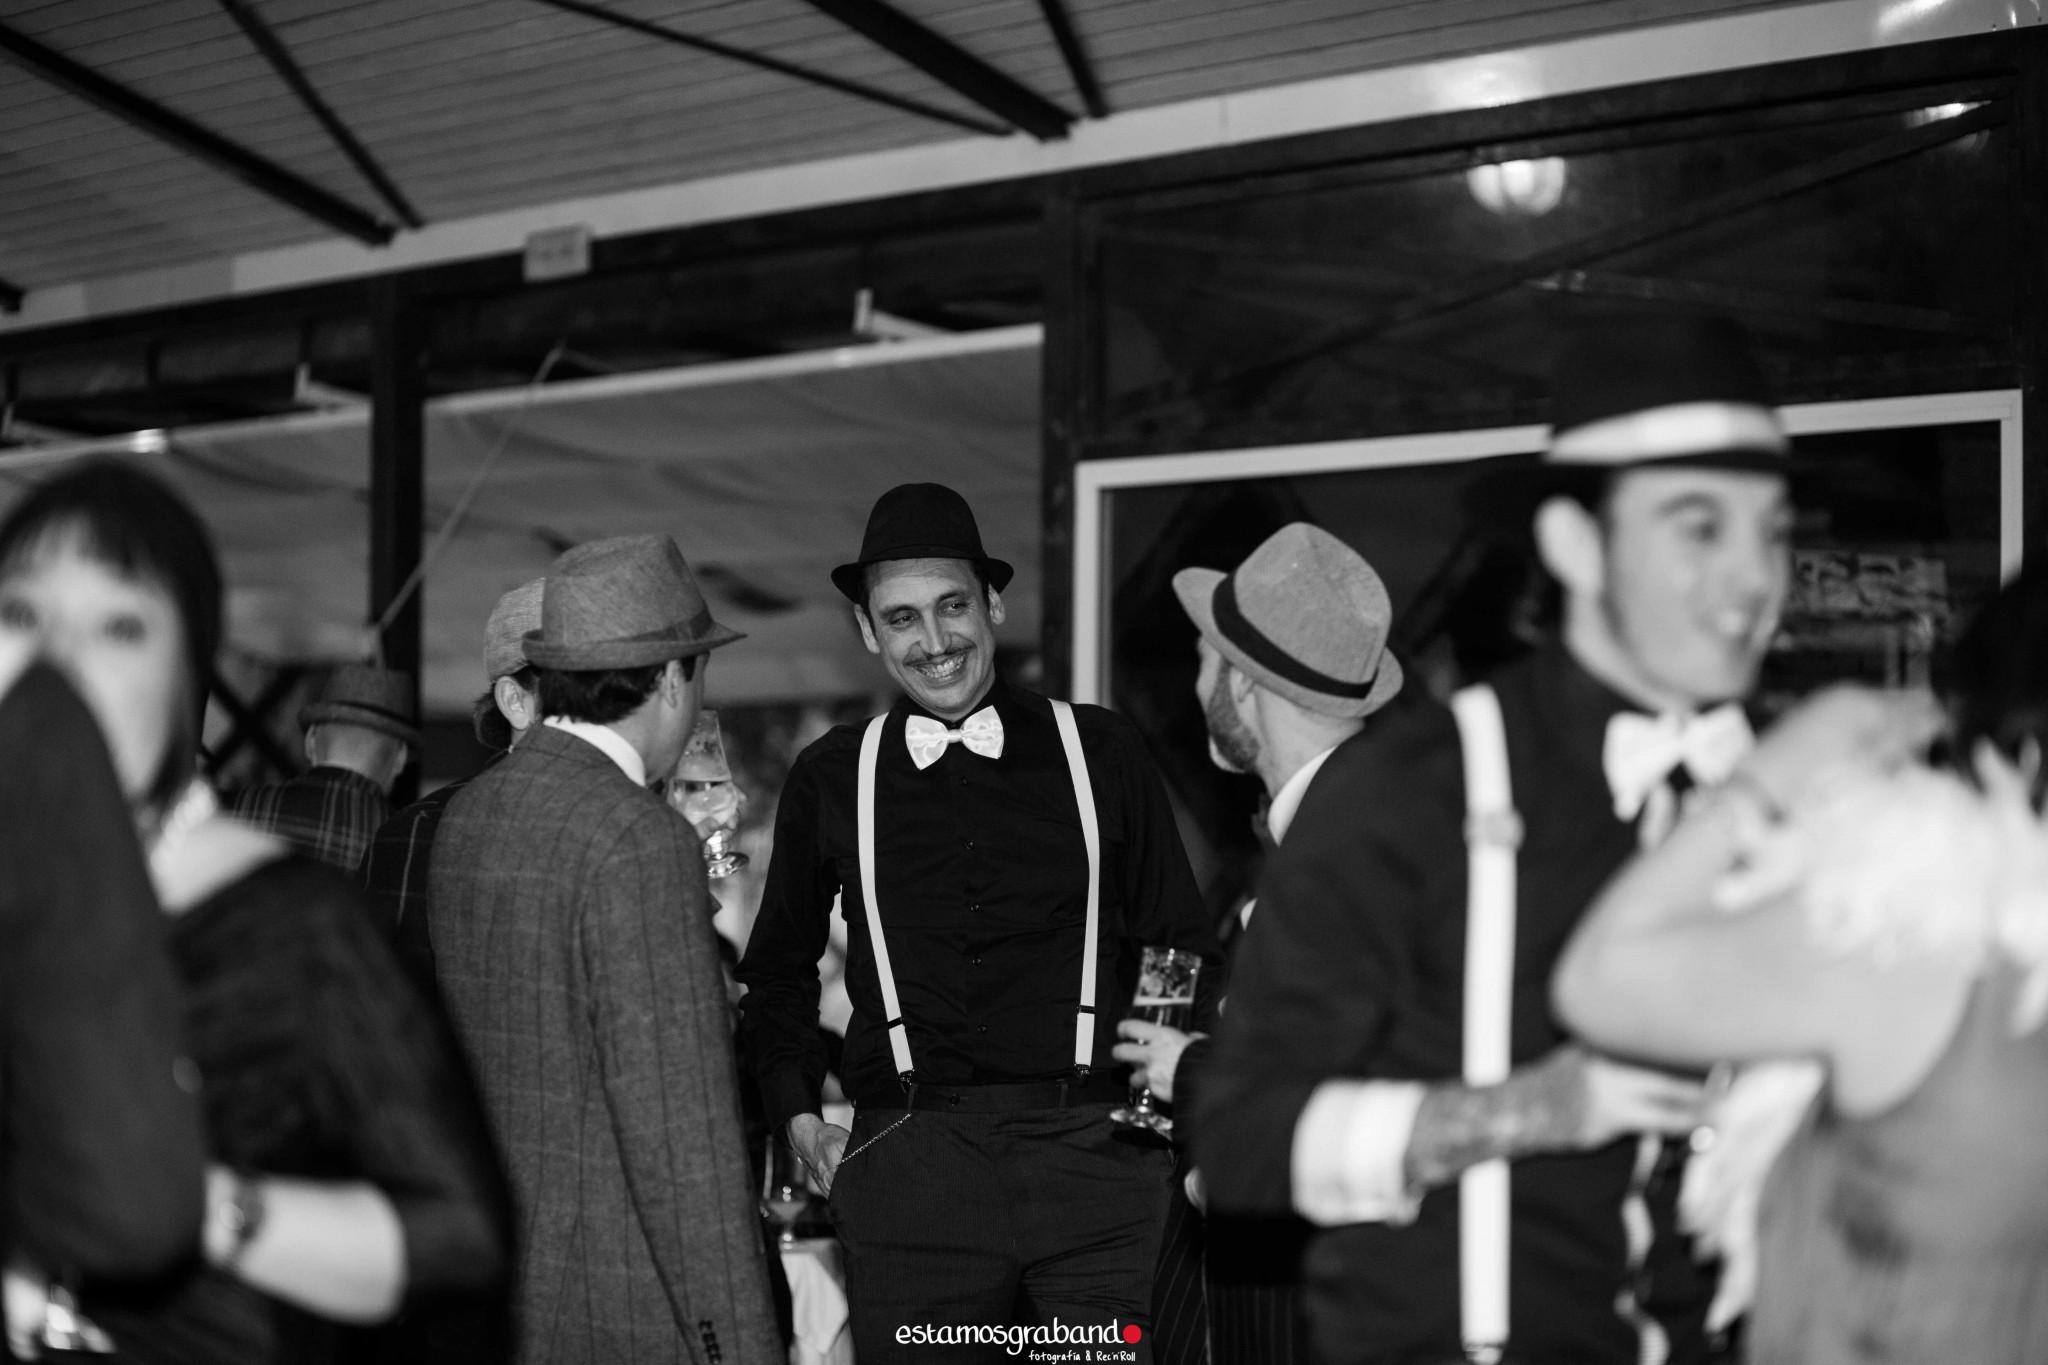 Fiesta a os 20 en la teta de julieta c diz estamosgrabando - Fiesta anos 20 ...